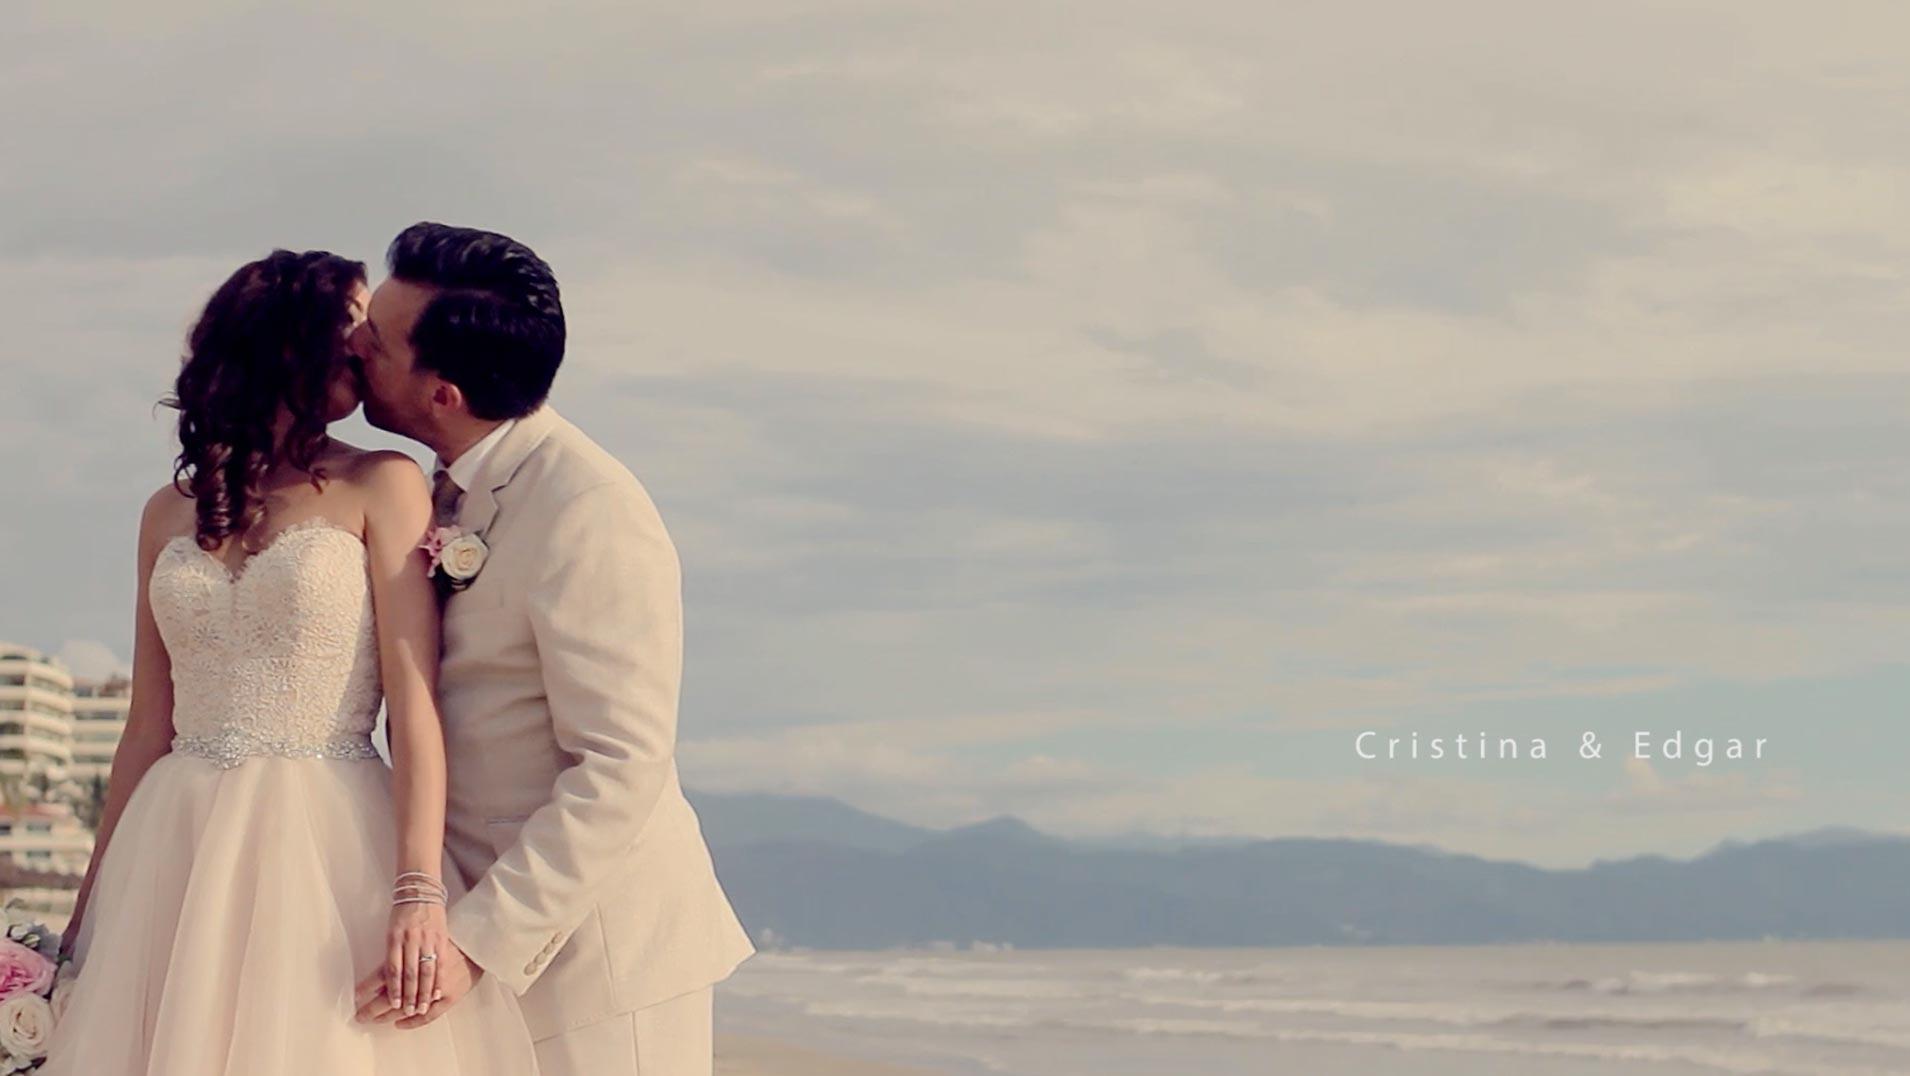 Cristina + Edgar